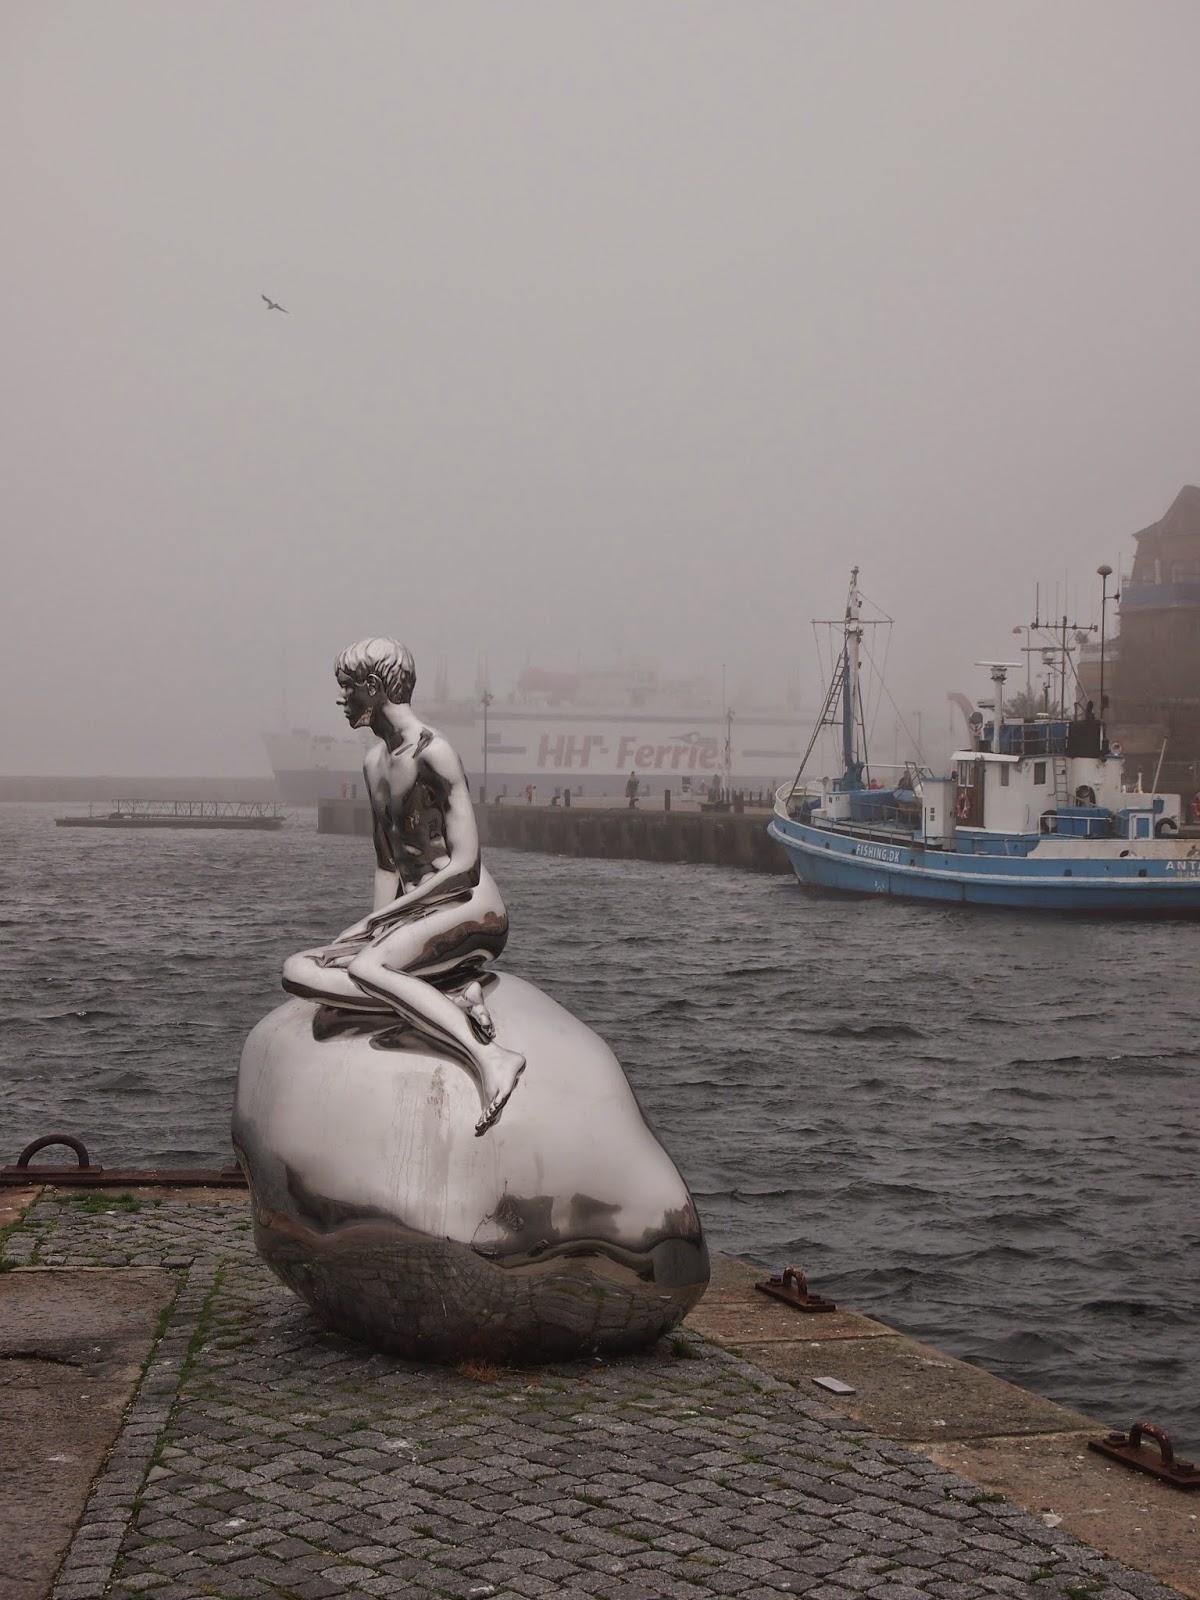 Han the merman statue in Helsingor